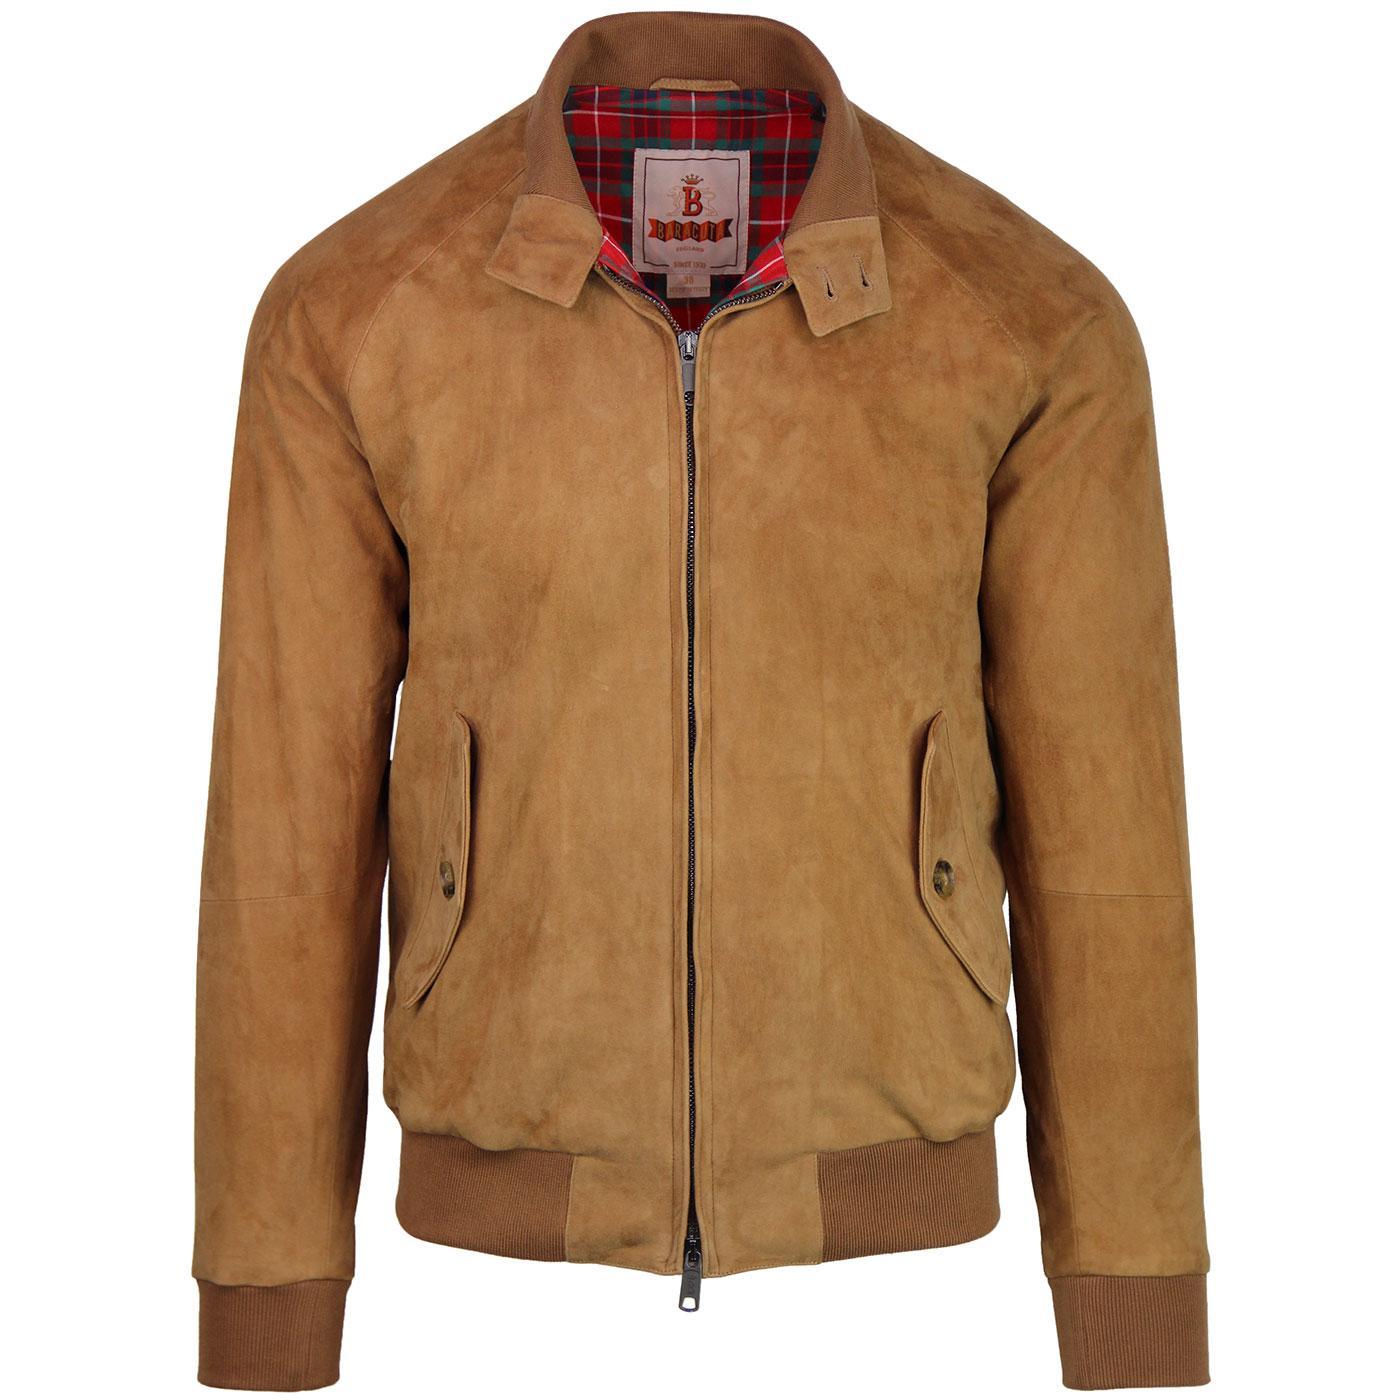 BARACUTA G9 Suede Mod Harrington Jacket (Tobacco)